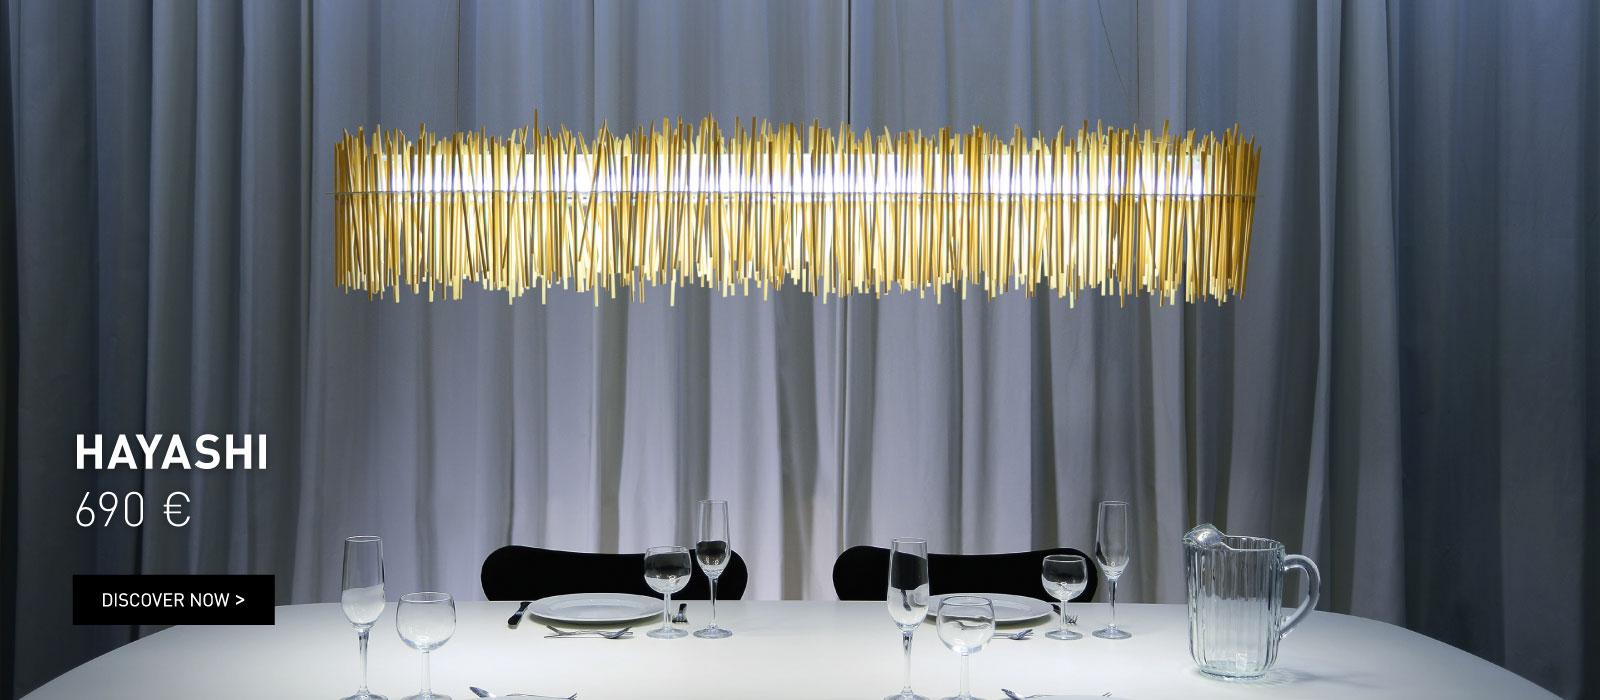 Pendant lamp HAYASHI | 690 €